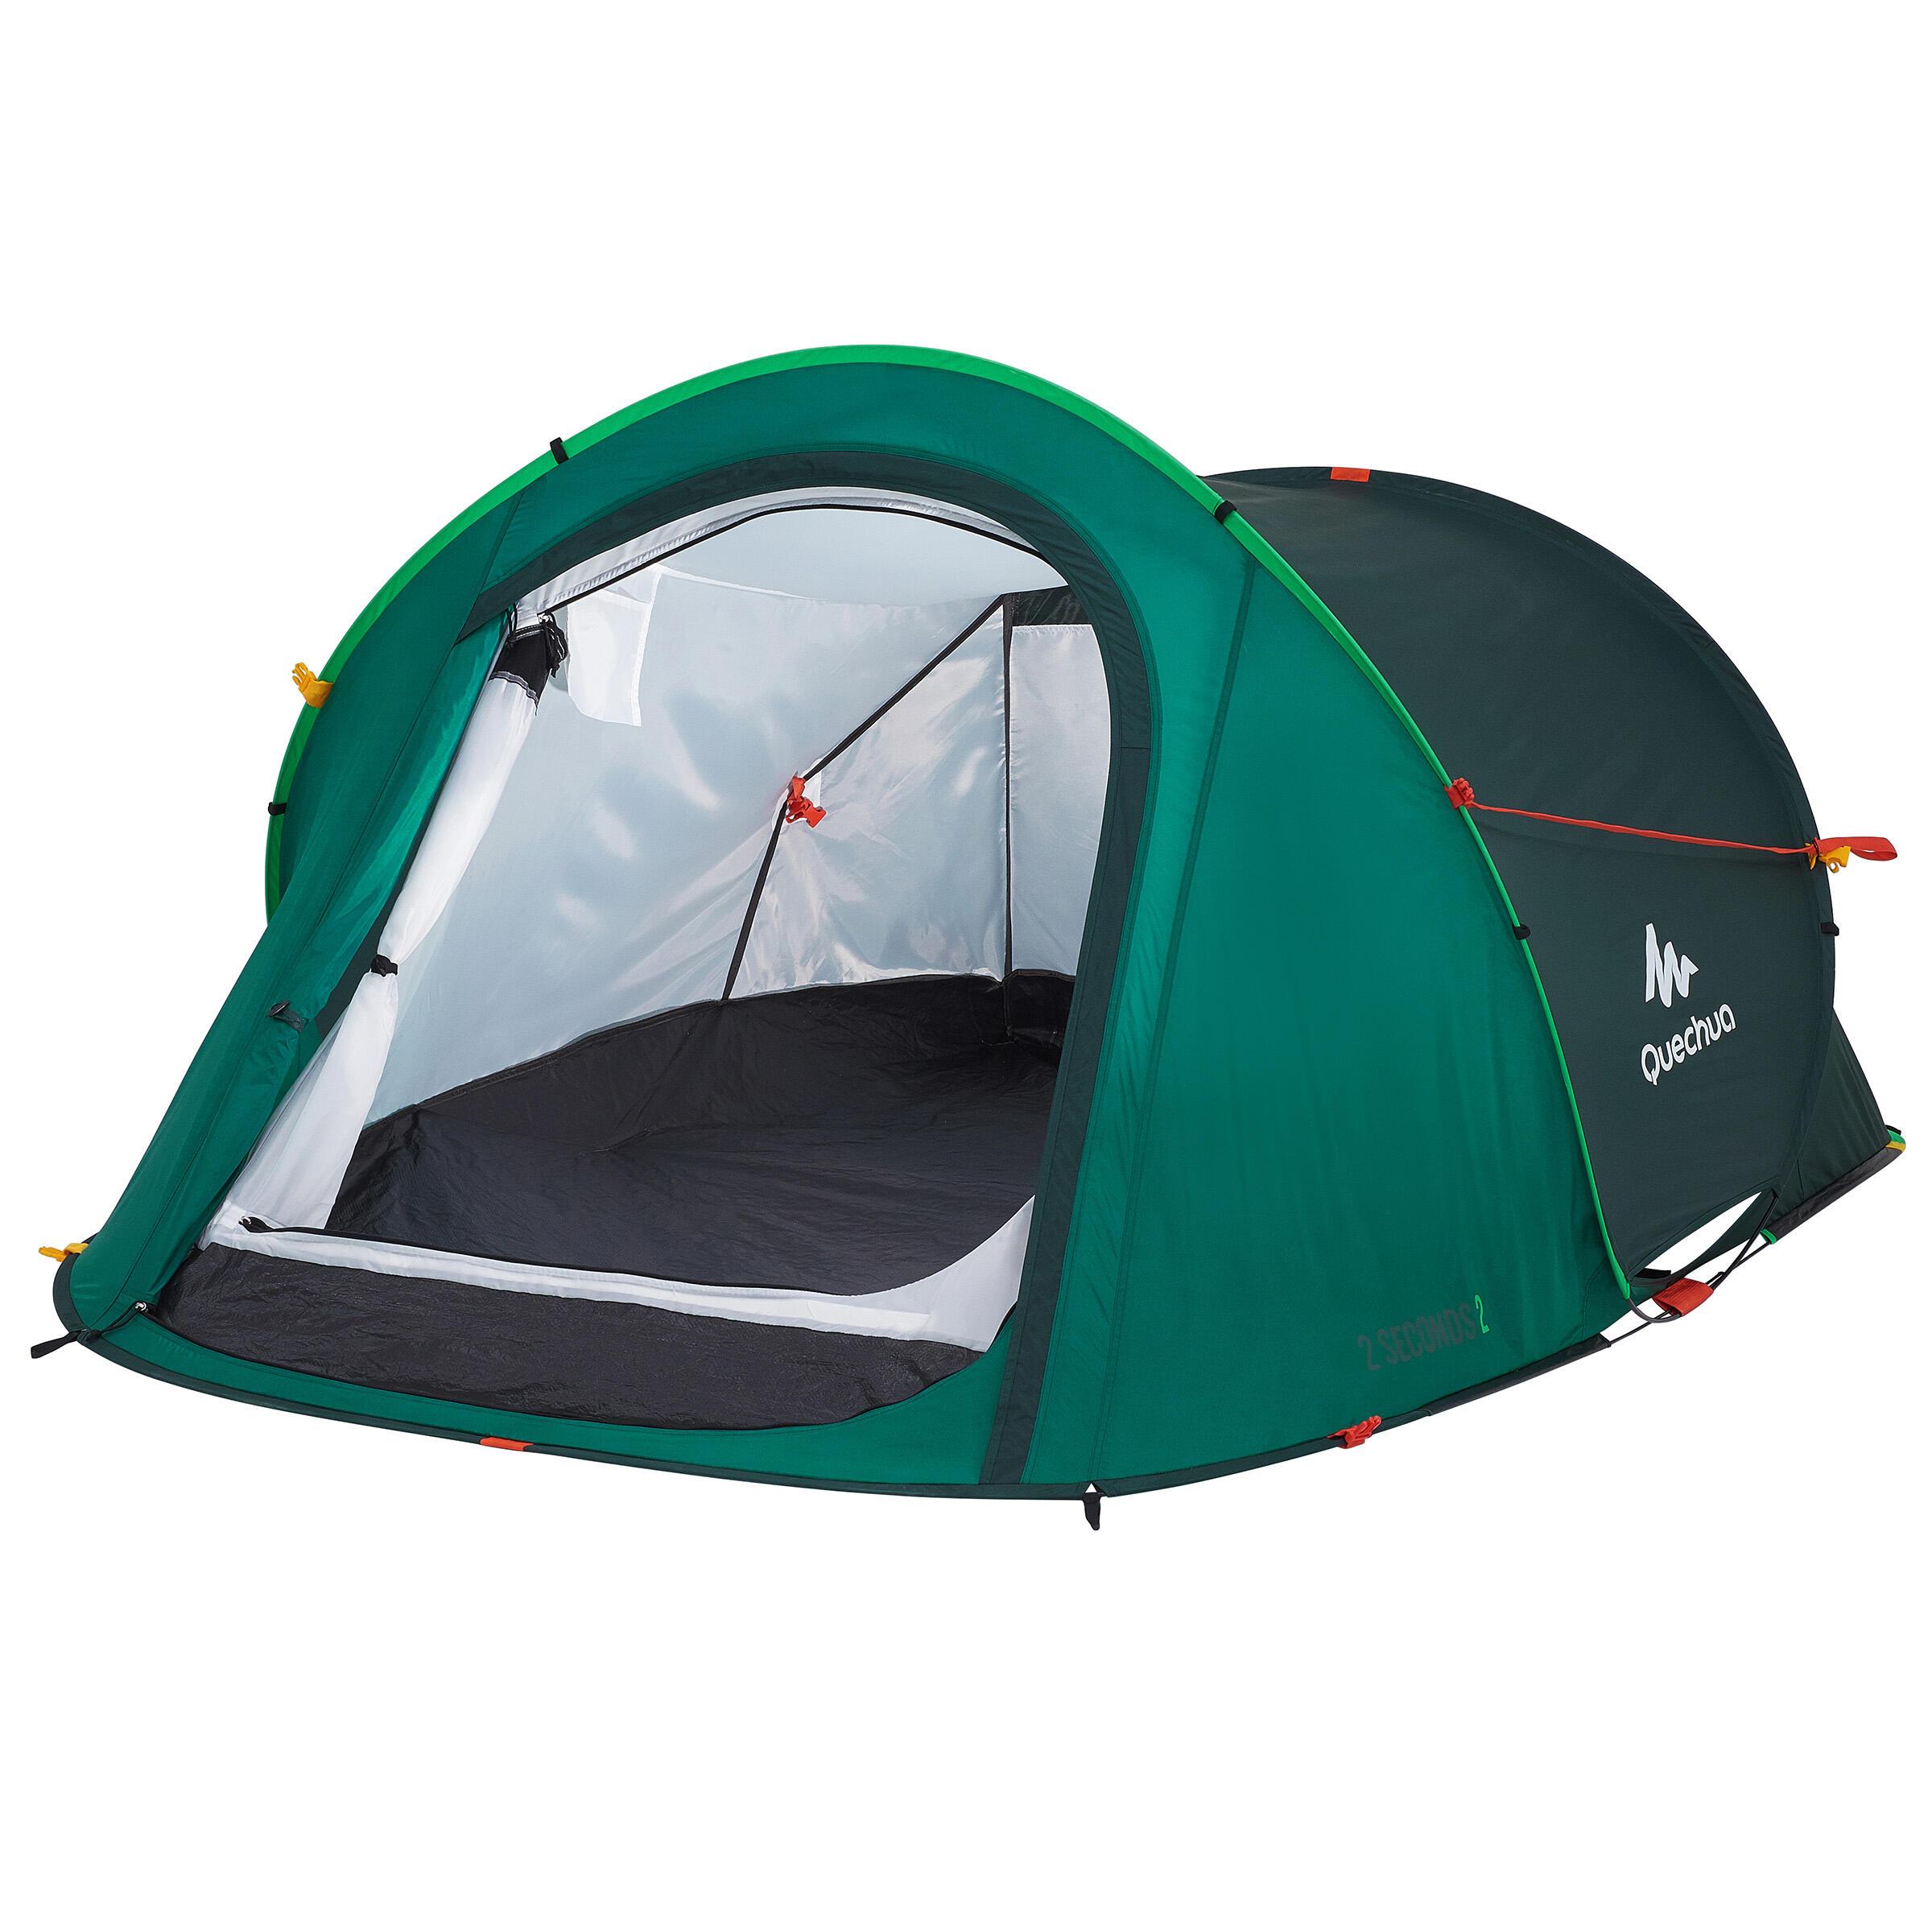 Zelt für 2 Personen Camping 2 Seconds grün | 03608439523519